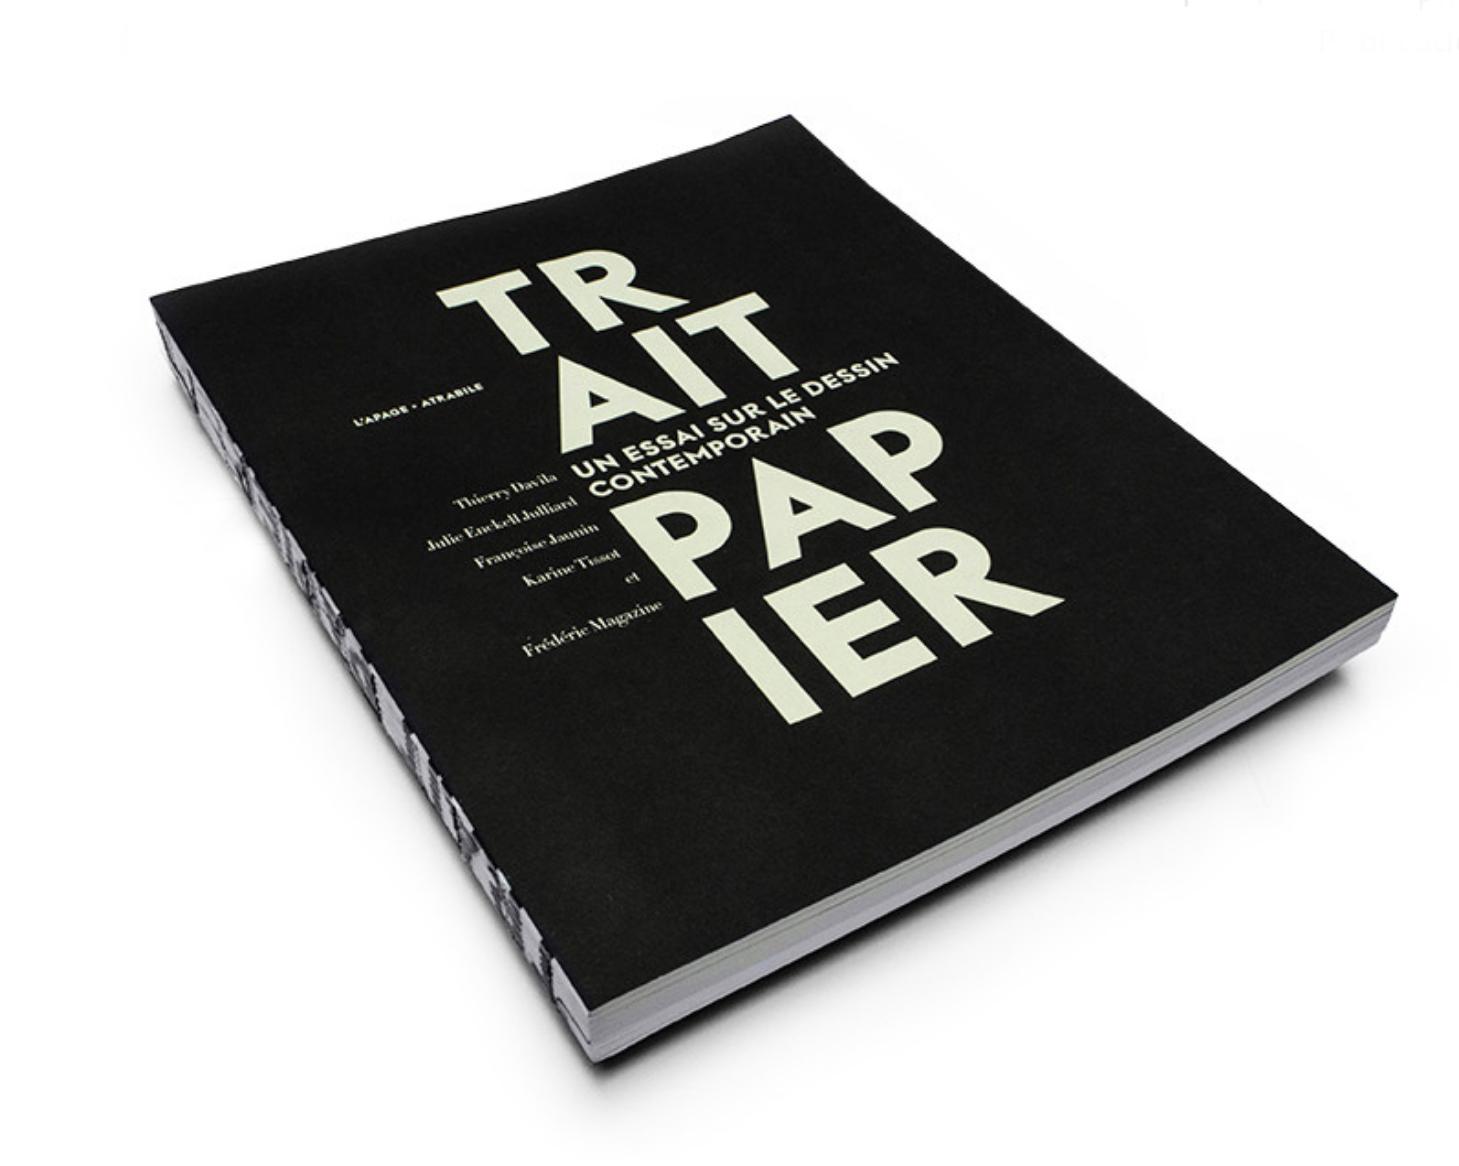 trait papier1.jpg